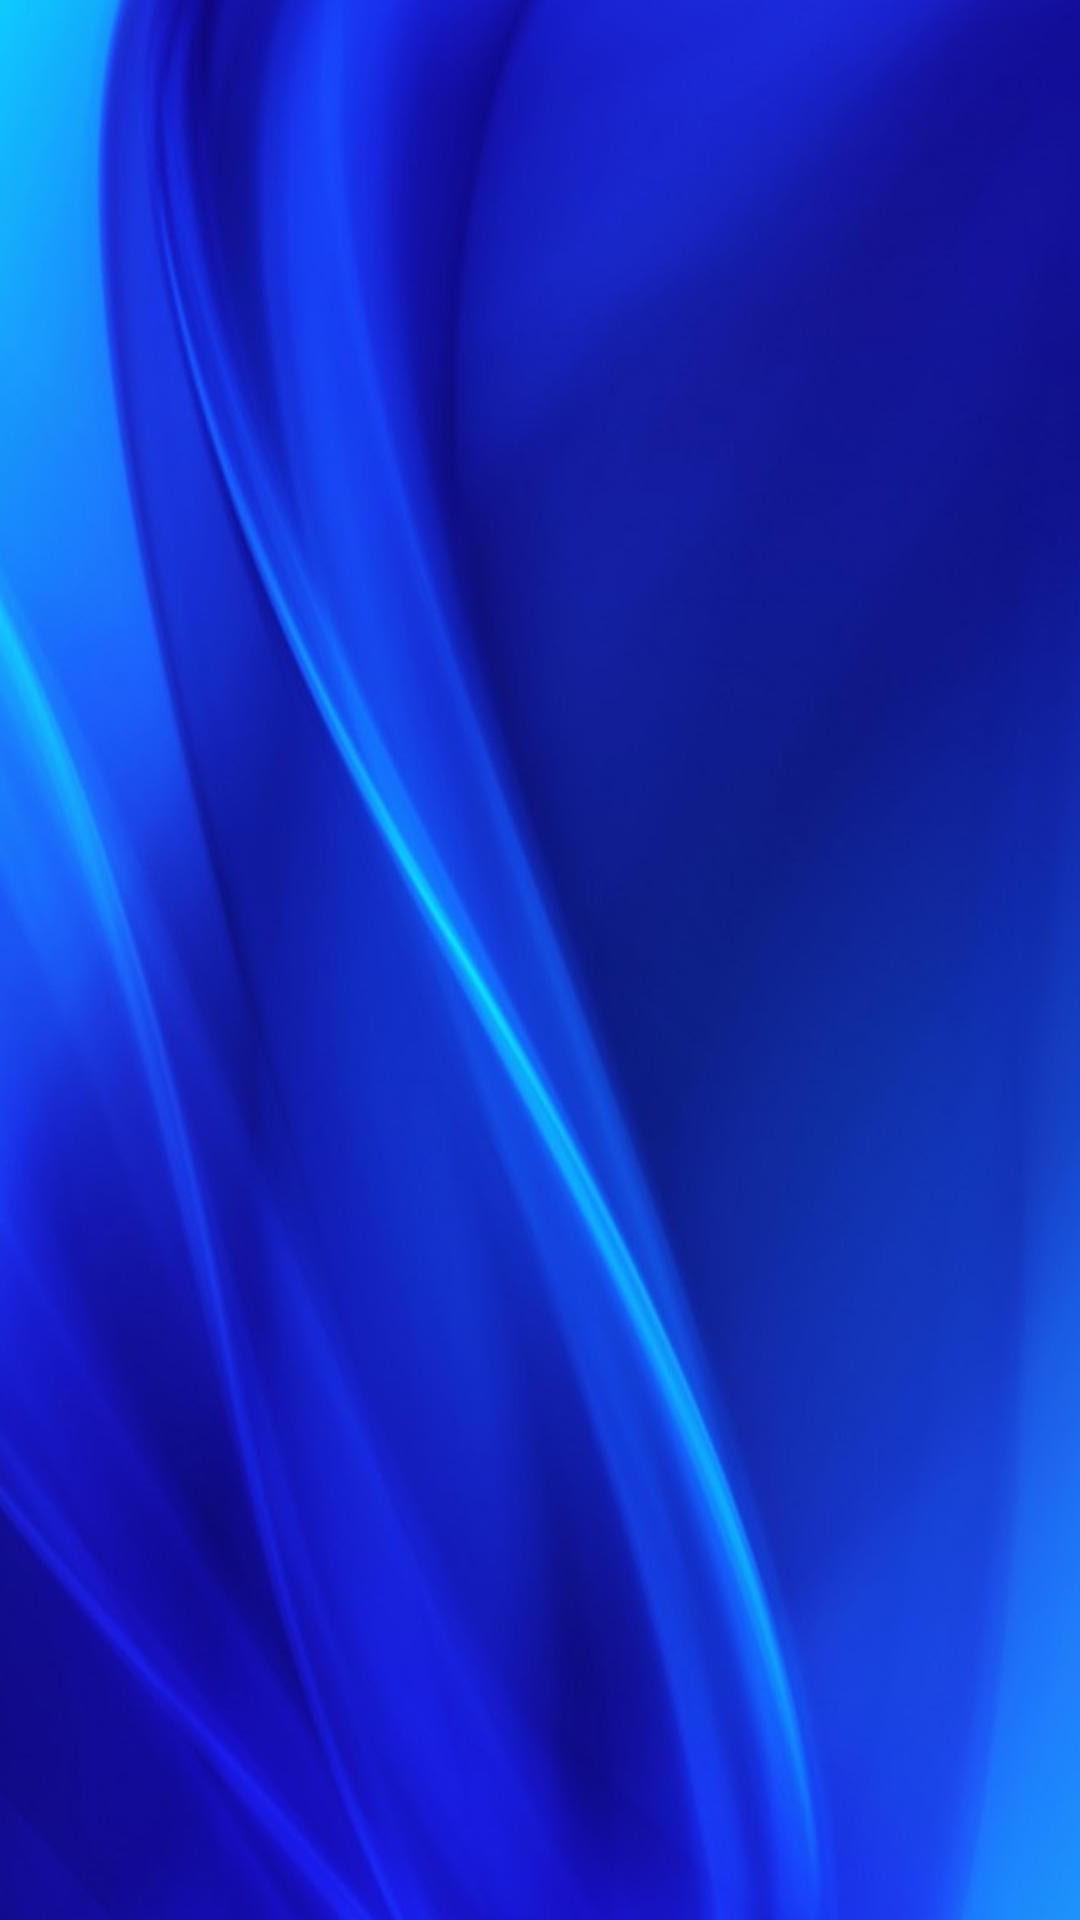 Unduh 9200 Koleksi Wallpaper Android Blue Hd HD Terbaru